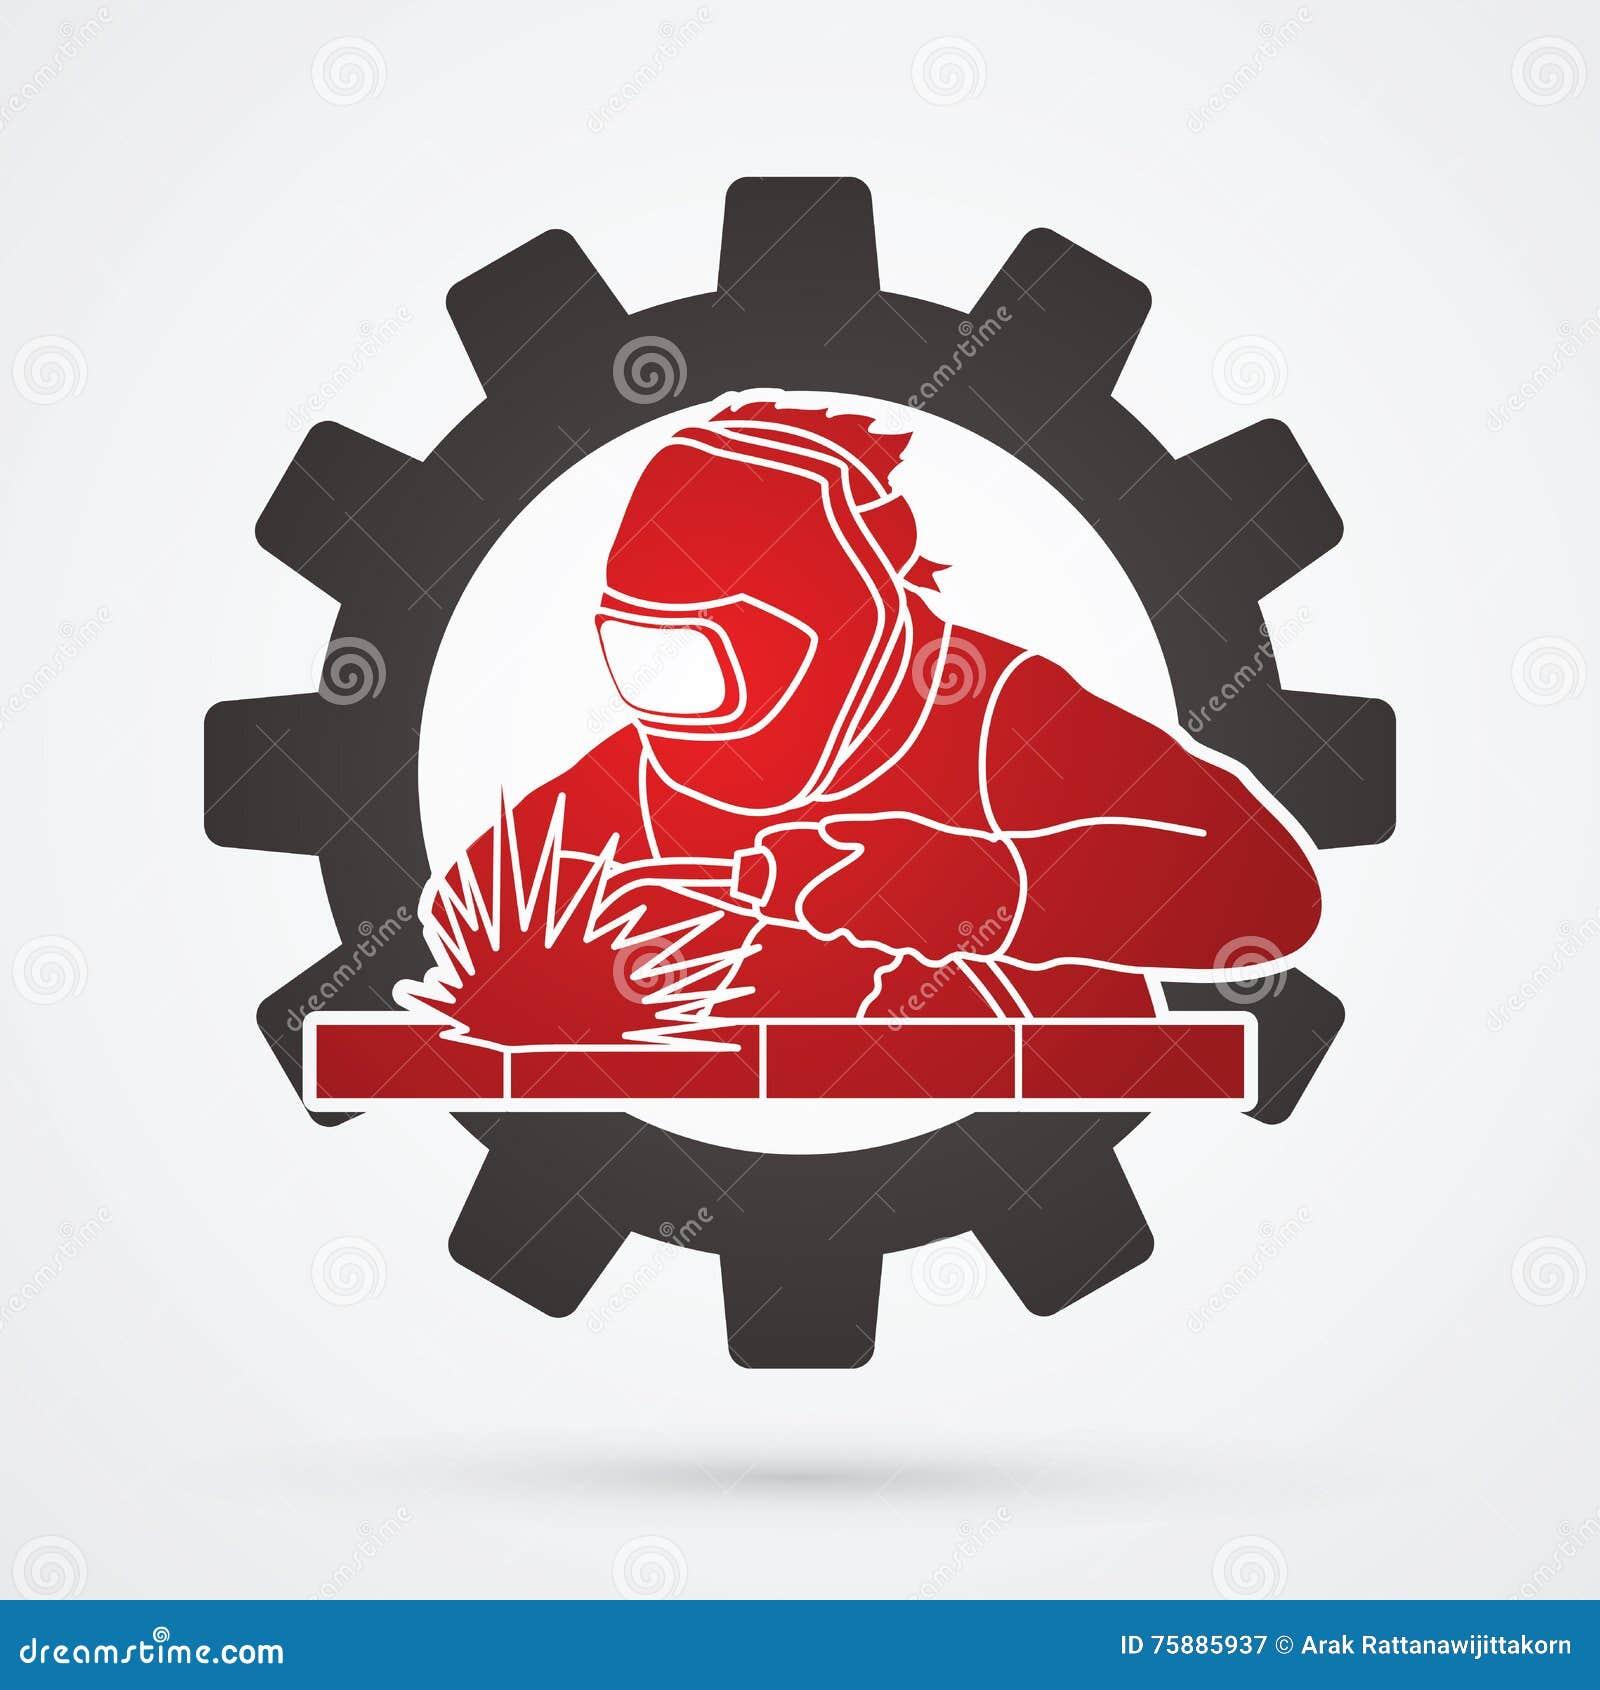 Welder stock vector. Illustration of logo, crafts, male ...